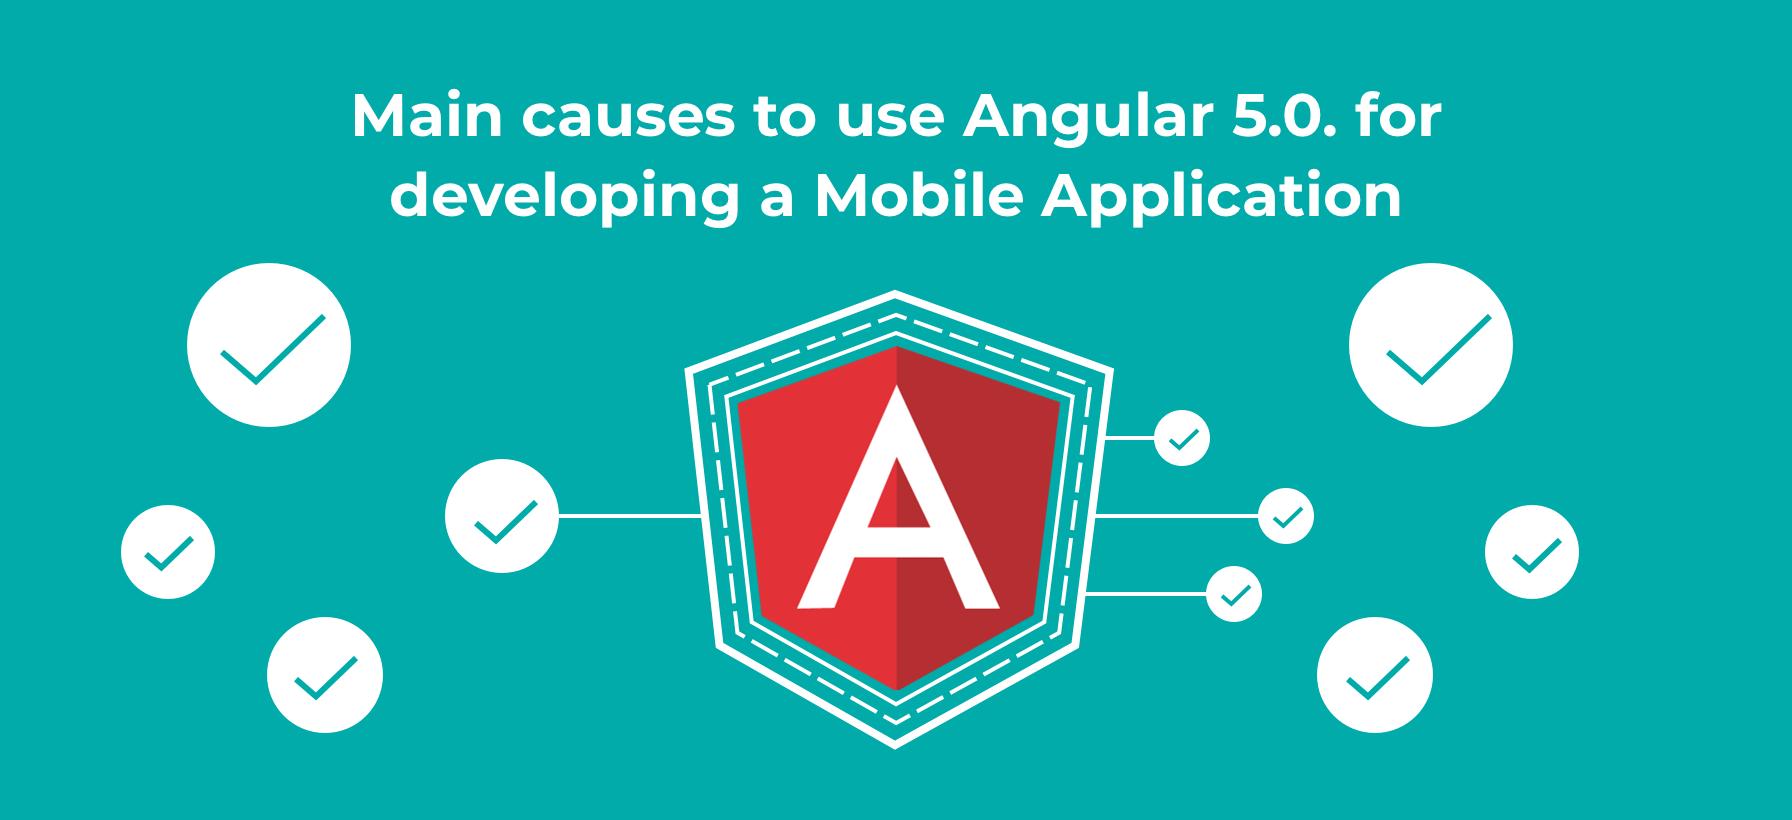 main-causes-to-use-angular